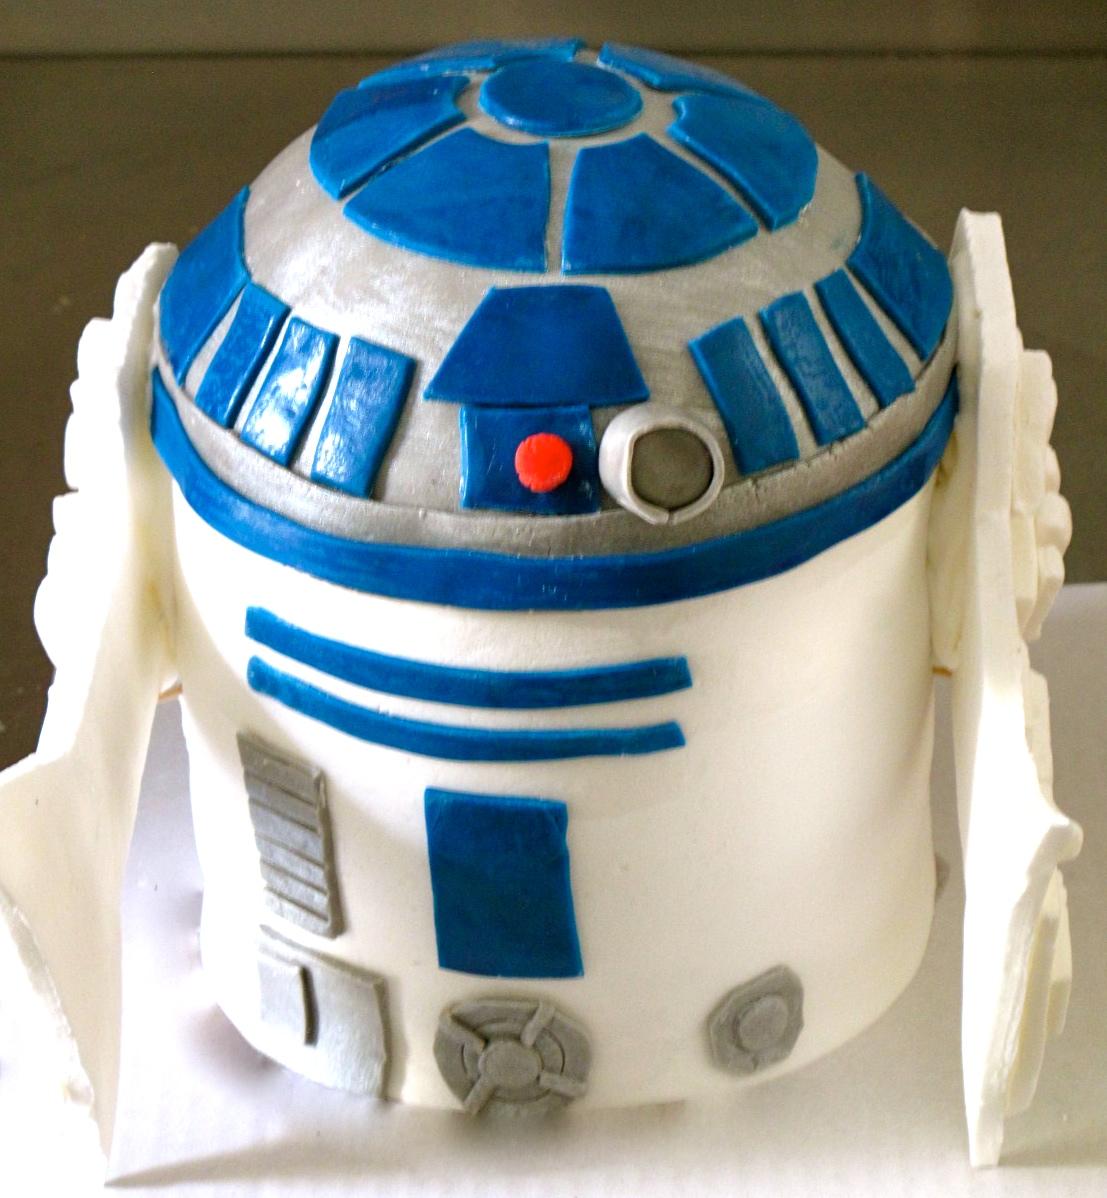 Torte4u R2d2 Star Wars Cake